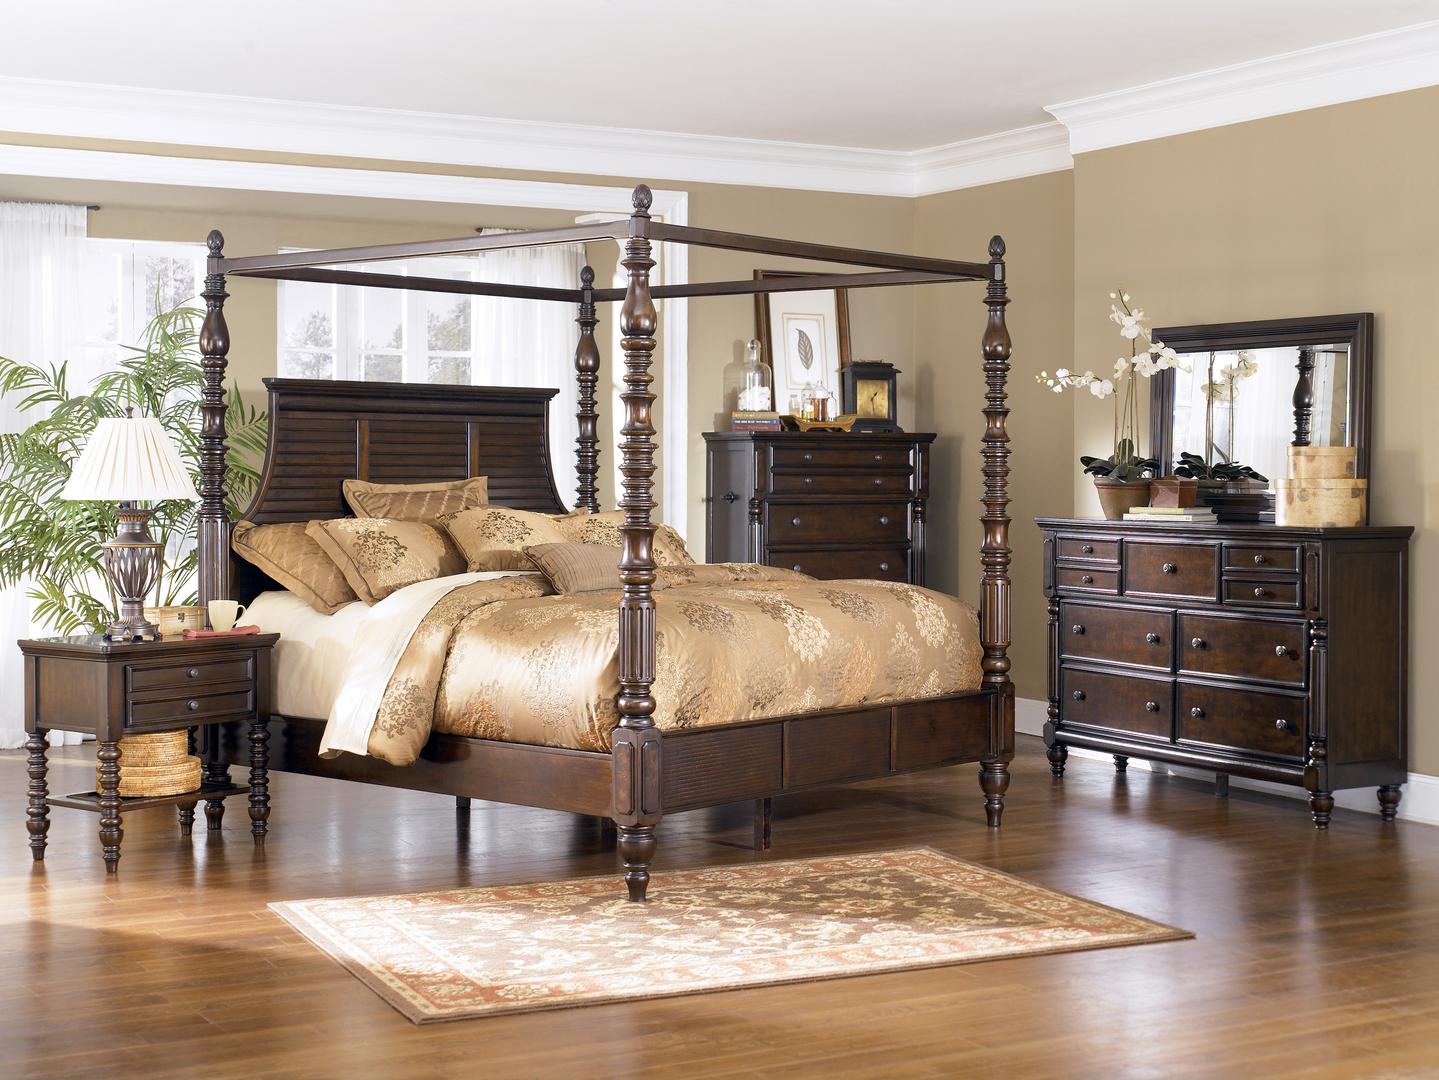 model home furniture photos